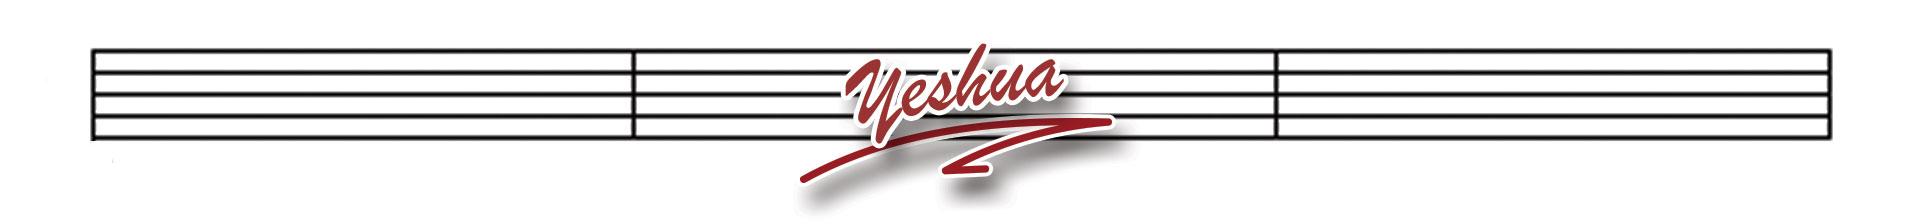 Yeshua-title